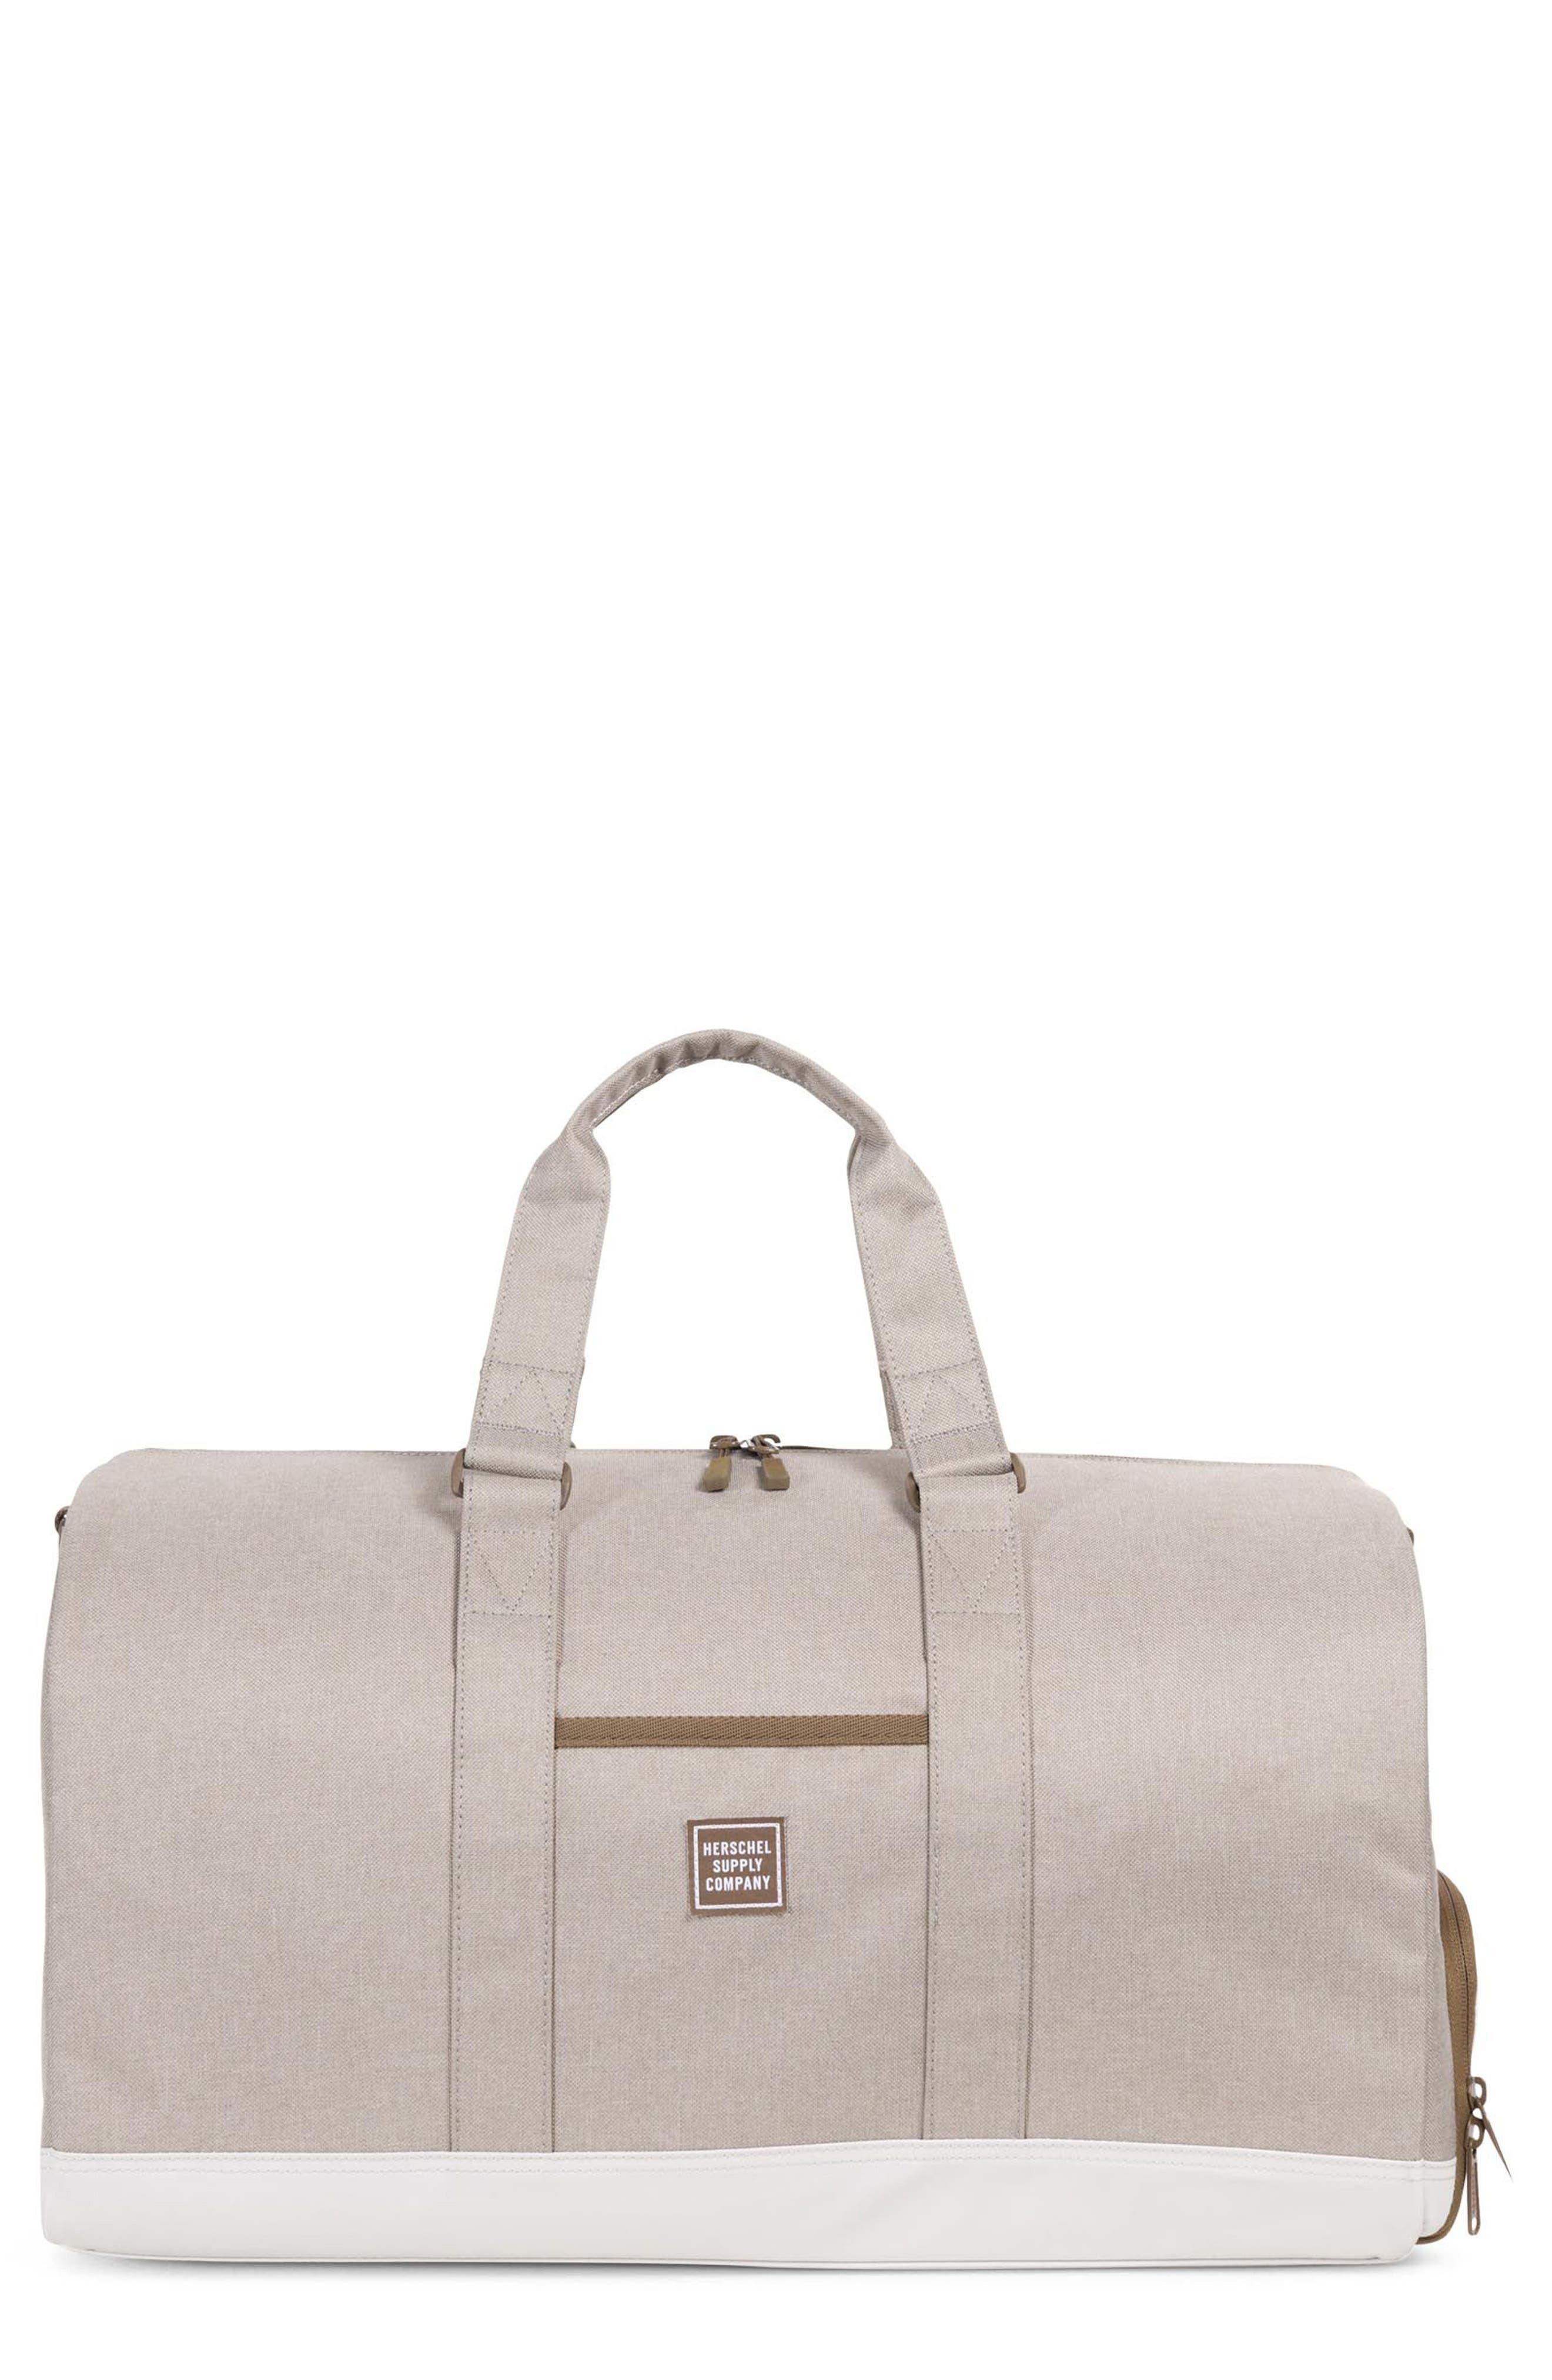 Aspect - Novel Duffel Bag,                         Main,                         color,